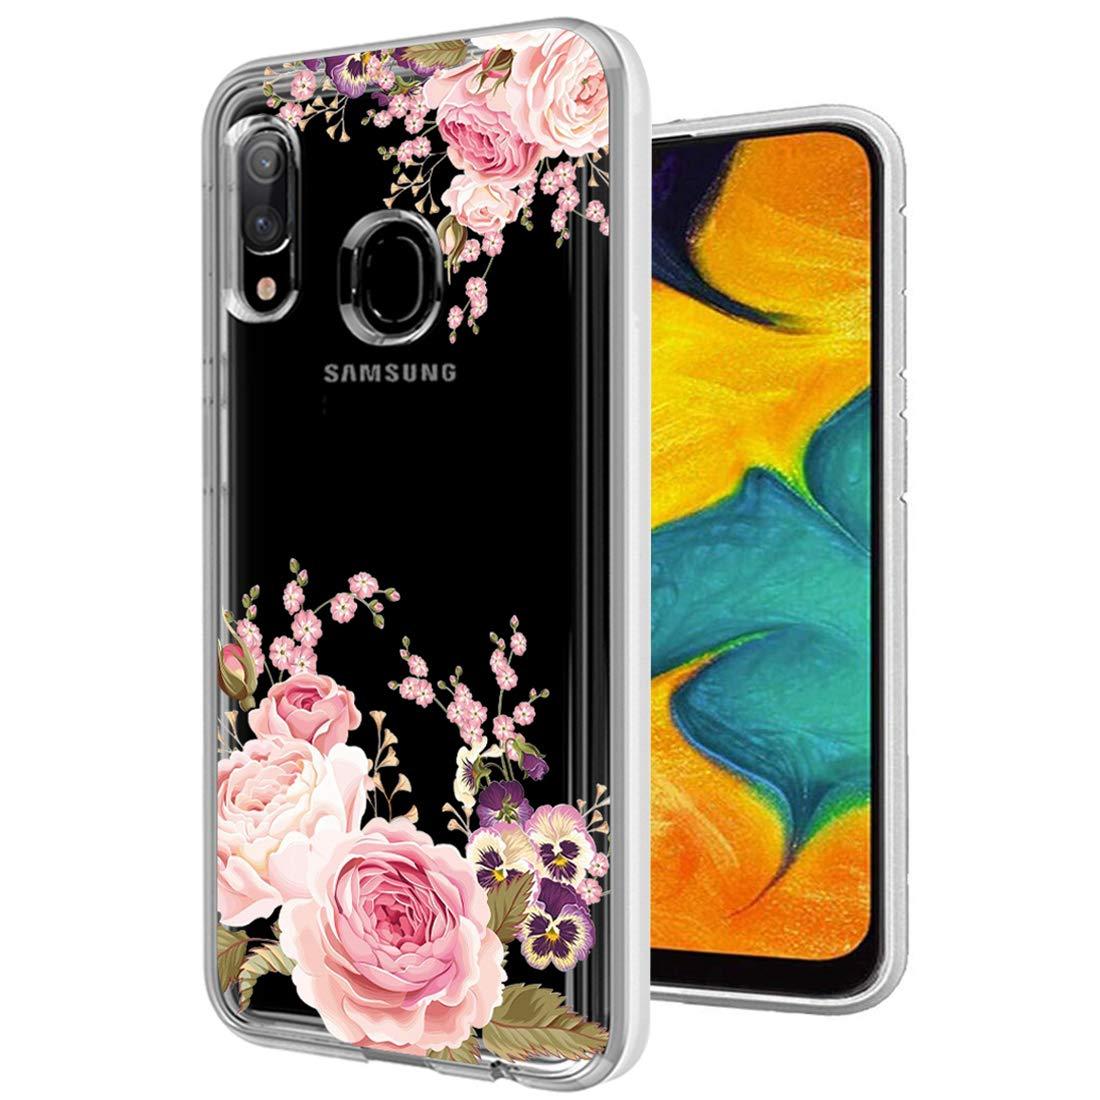 Funda Para Samsung Galaxy A20 / A30 Ueokeird [7v5bfrb1]